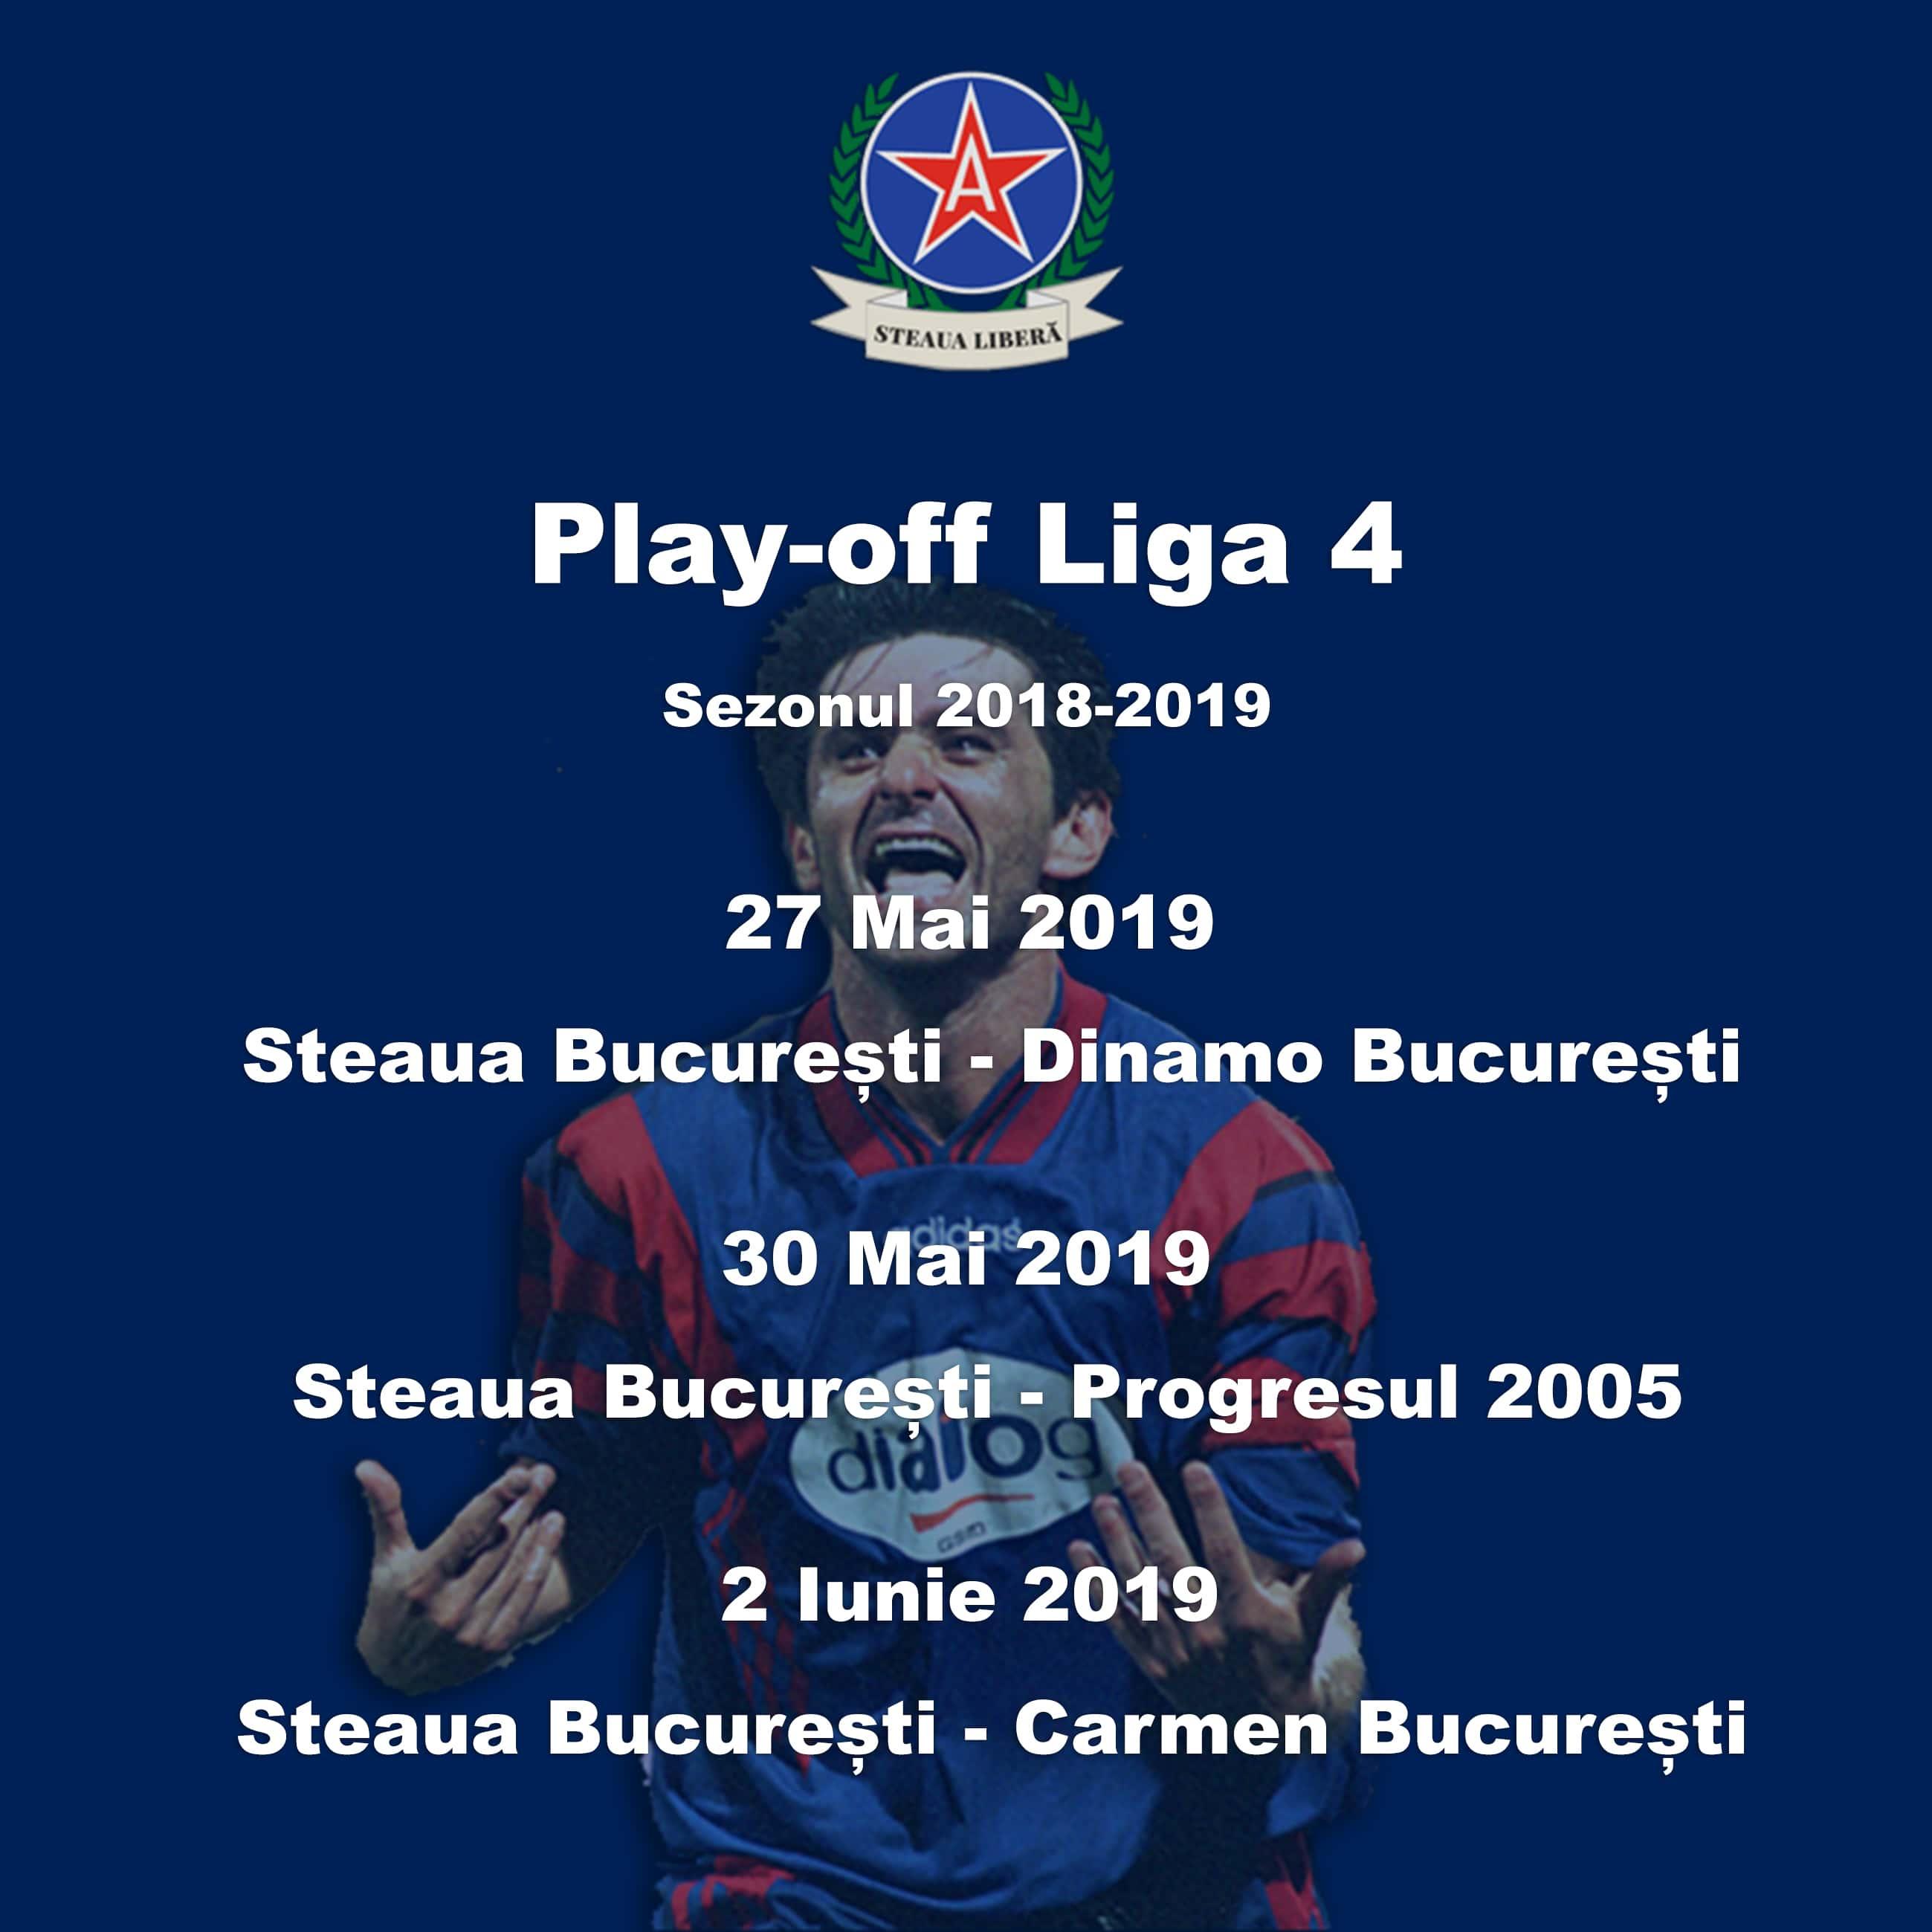 play-off liga 4